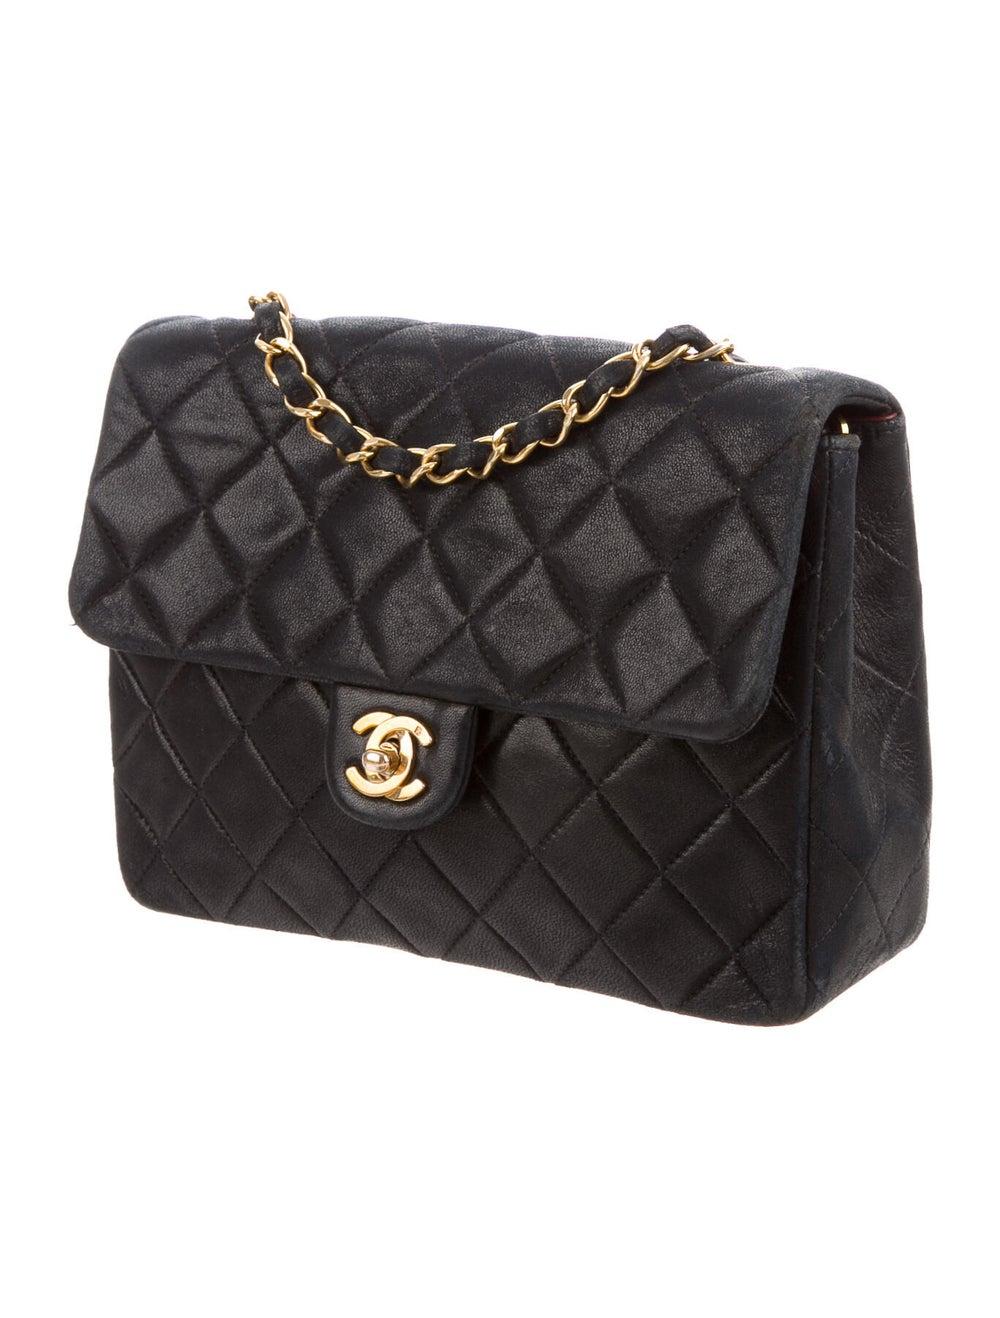 Chanel Vintage Classic Small Single Flap Bag Blue - image 3